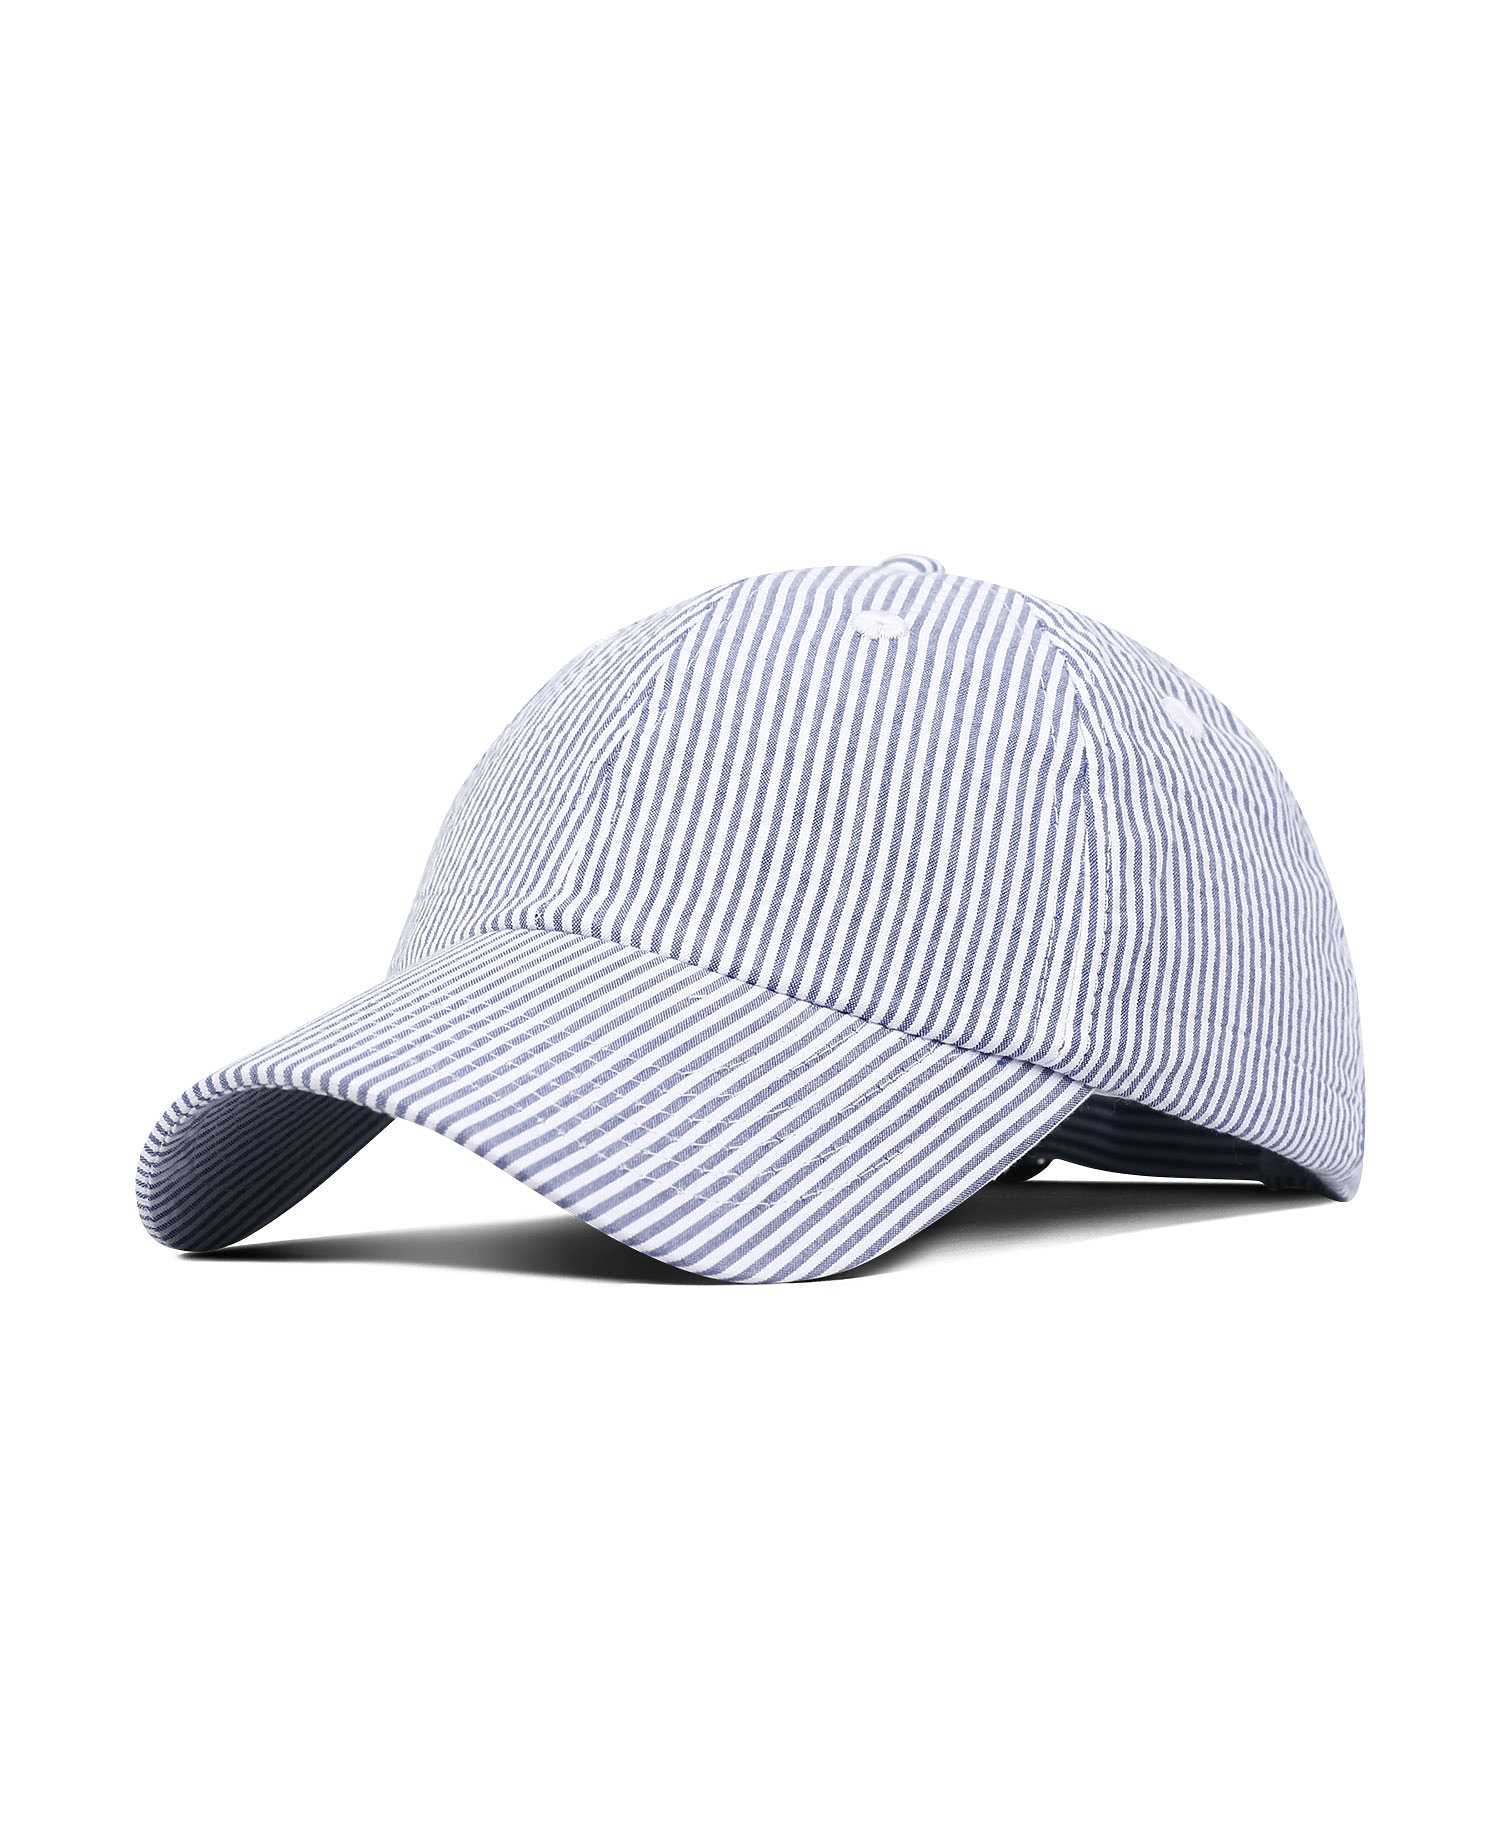 Fahrenheit F0303 - Lightweight Cotton Searsucker Cap